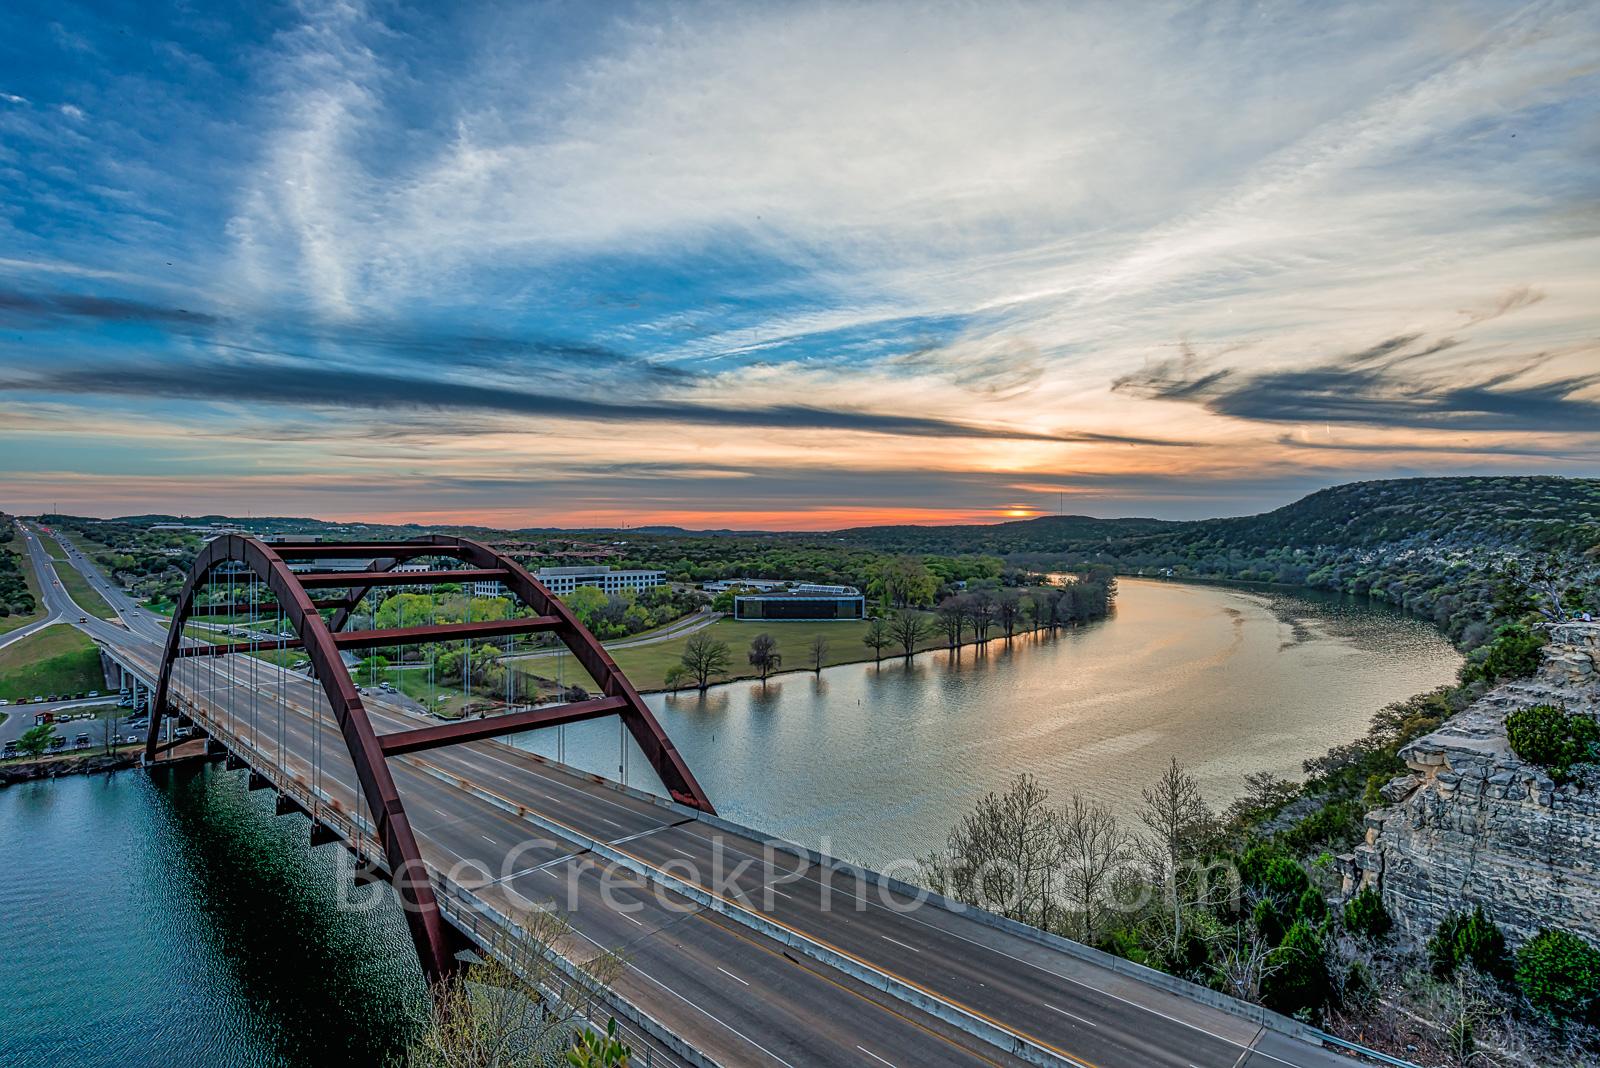 Austin sunset, 360 bridge, Austin 360 bridge, austin 360, austin 360 photos, Austin Pennybacker bridge, 360 Bridge austin, austin 360, pictures of austin tx,  images of austin, images of texas, texas , photo